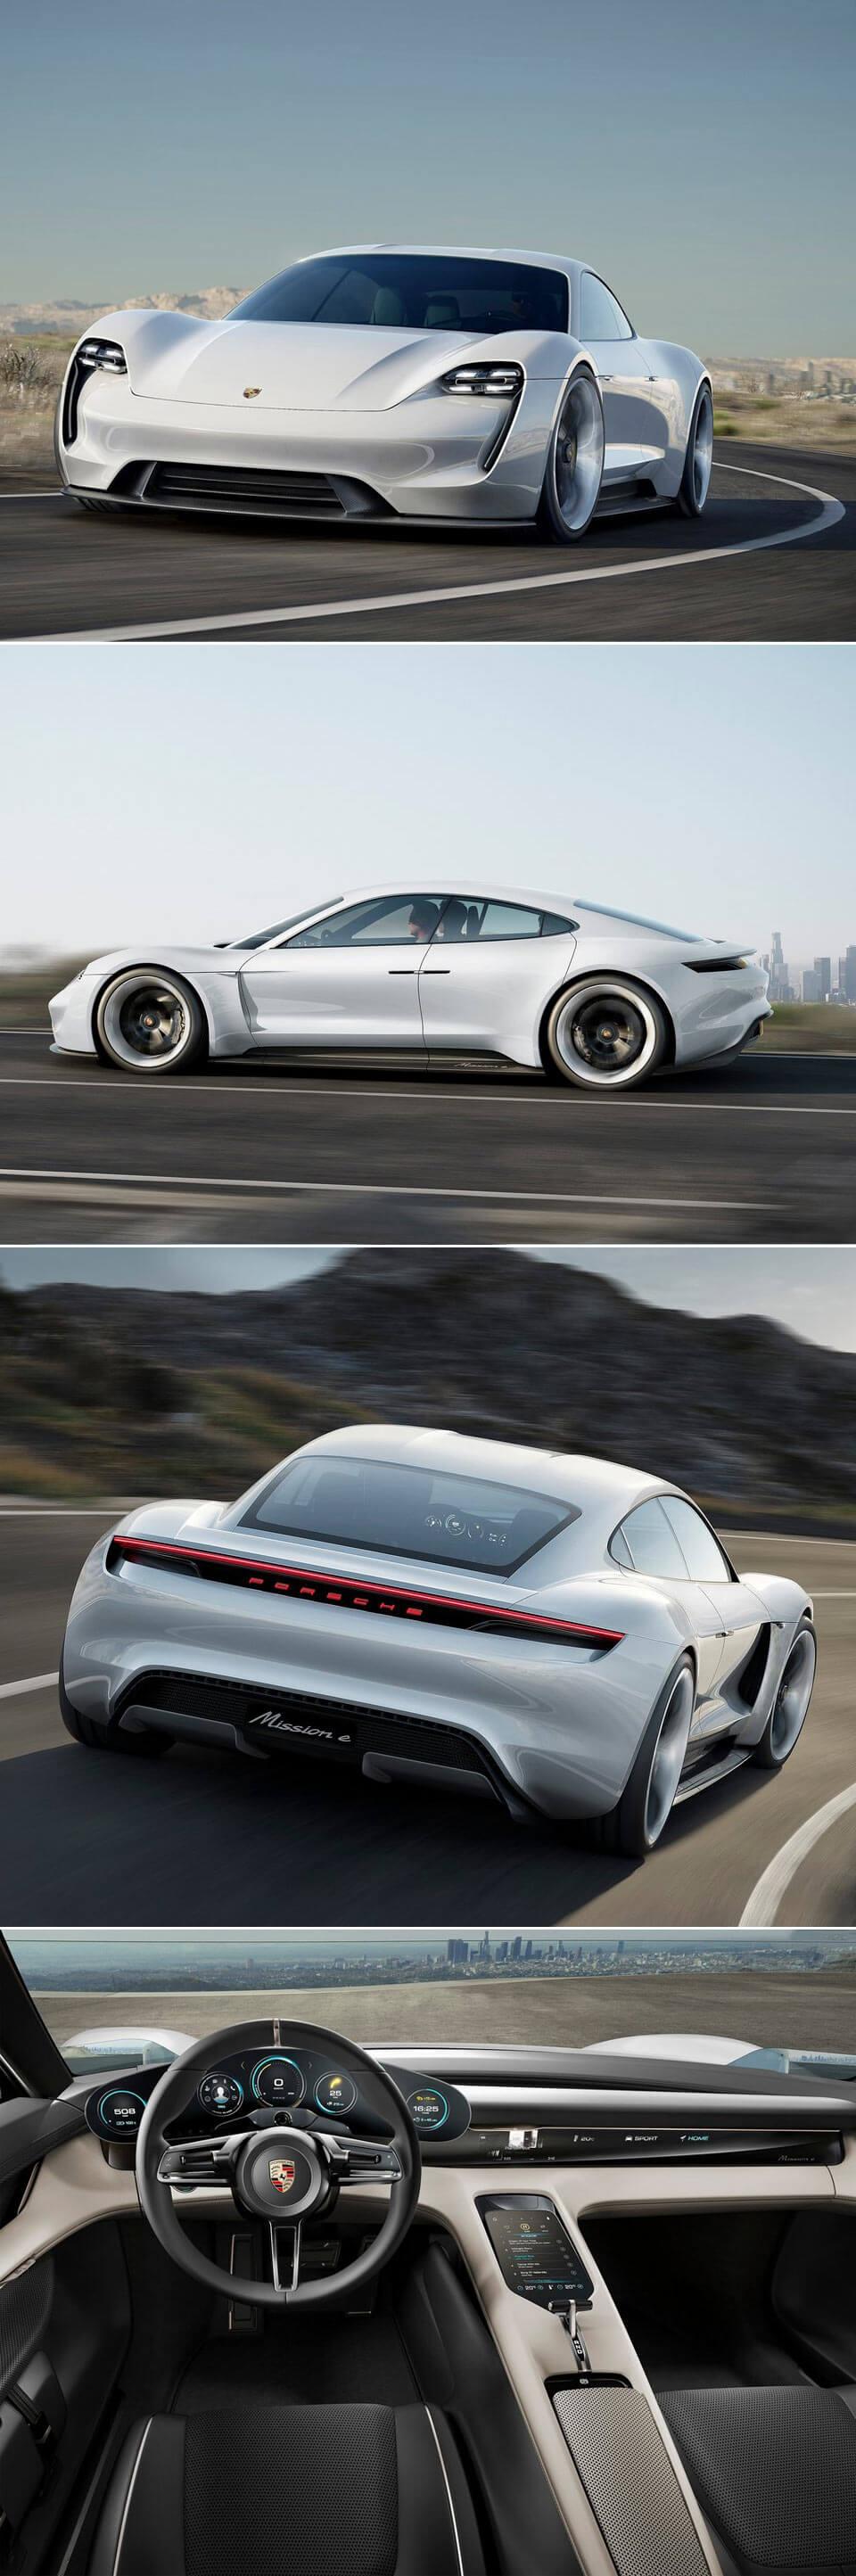 Fotos de carros: Porsche Mission E Concept